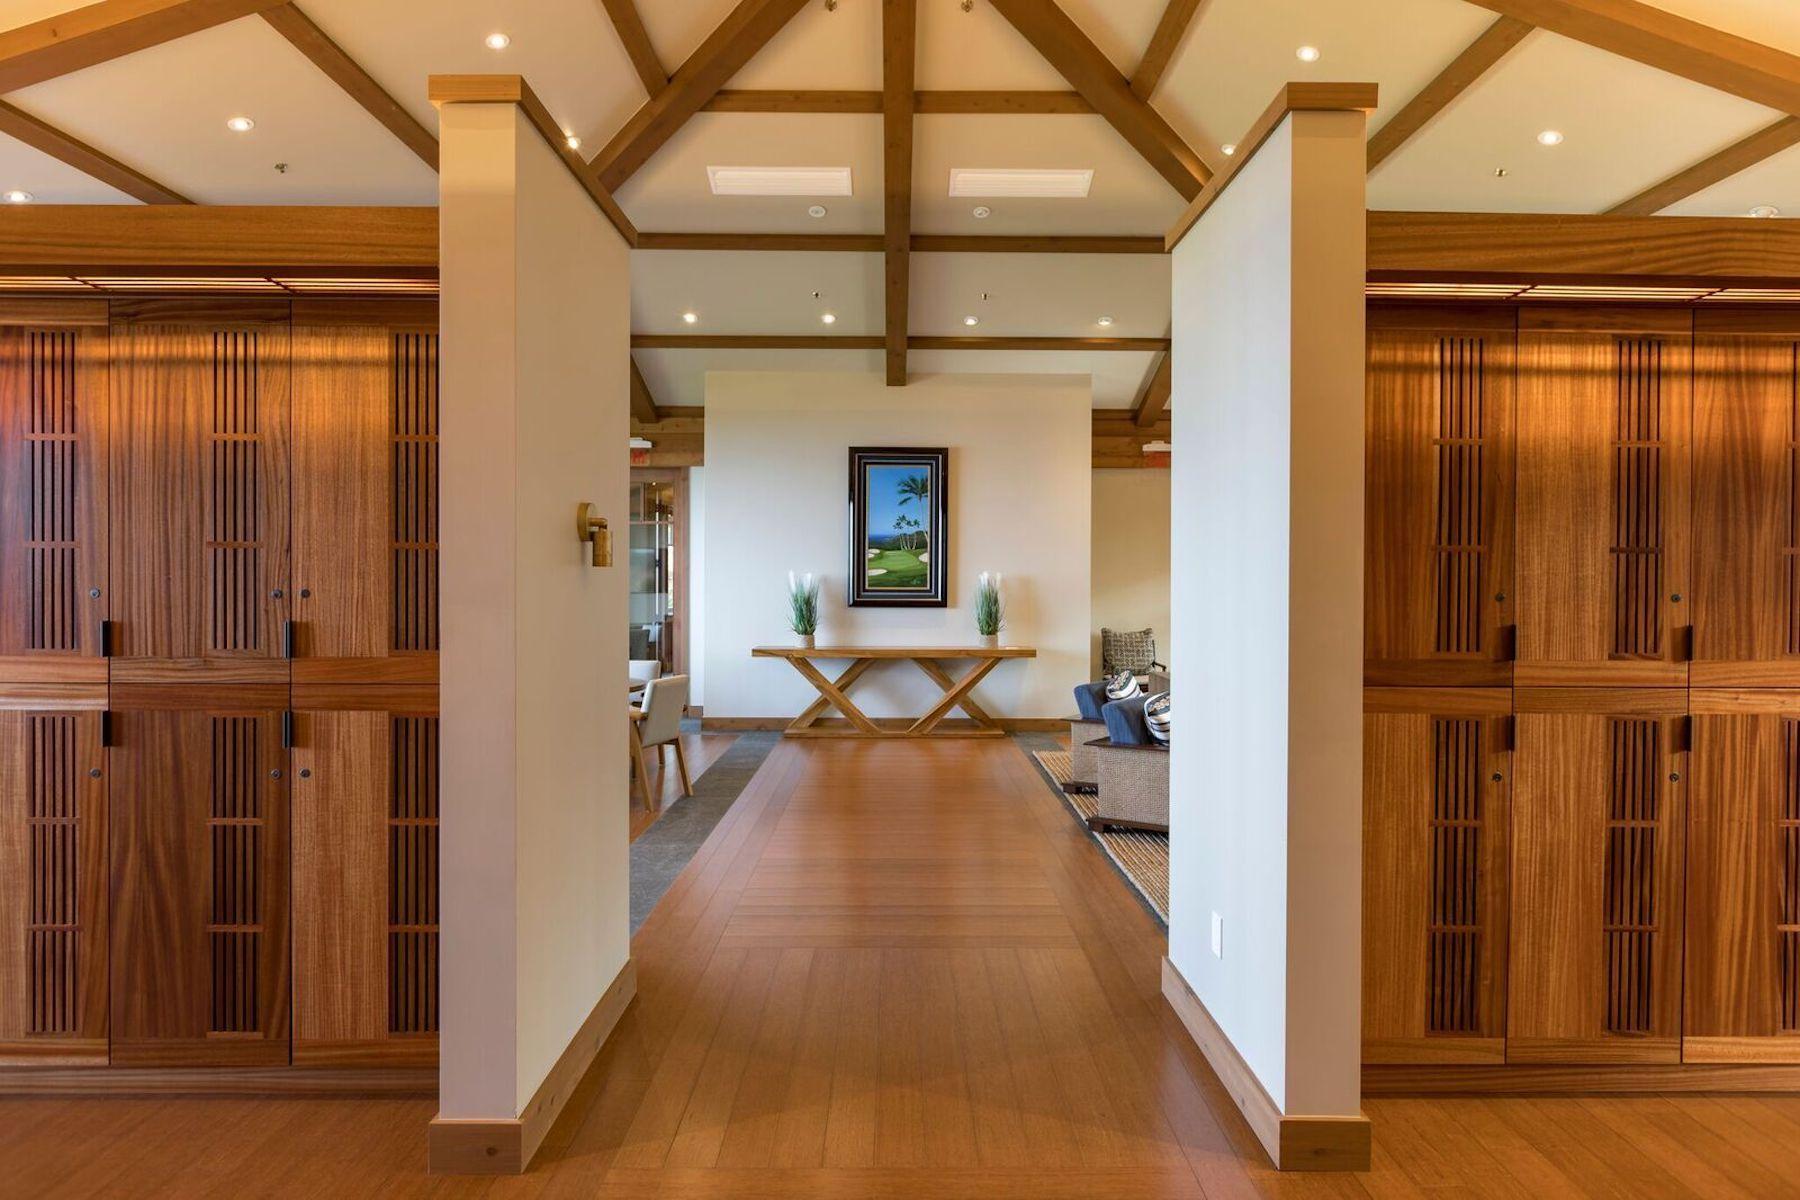 Land for Sale at Hokulia 81-6500 Mamaka Pl Kealakekua, Hawaii 96750 United States